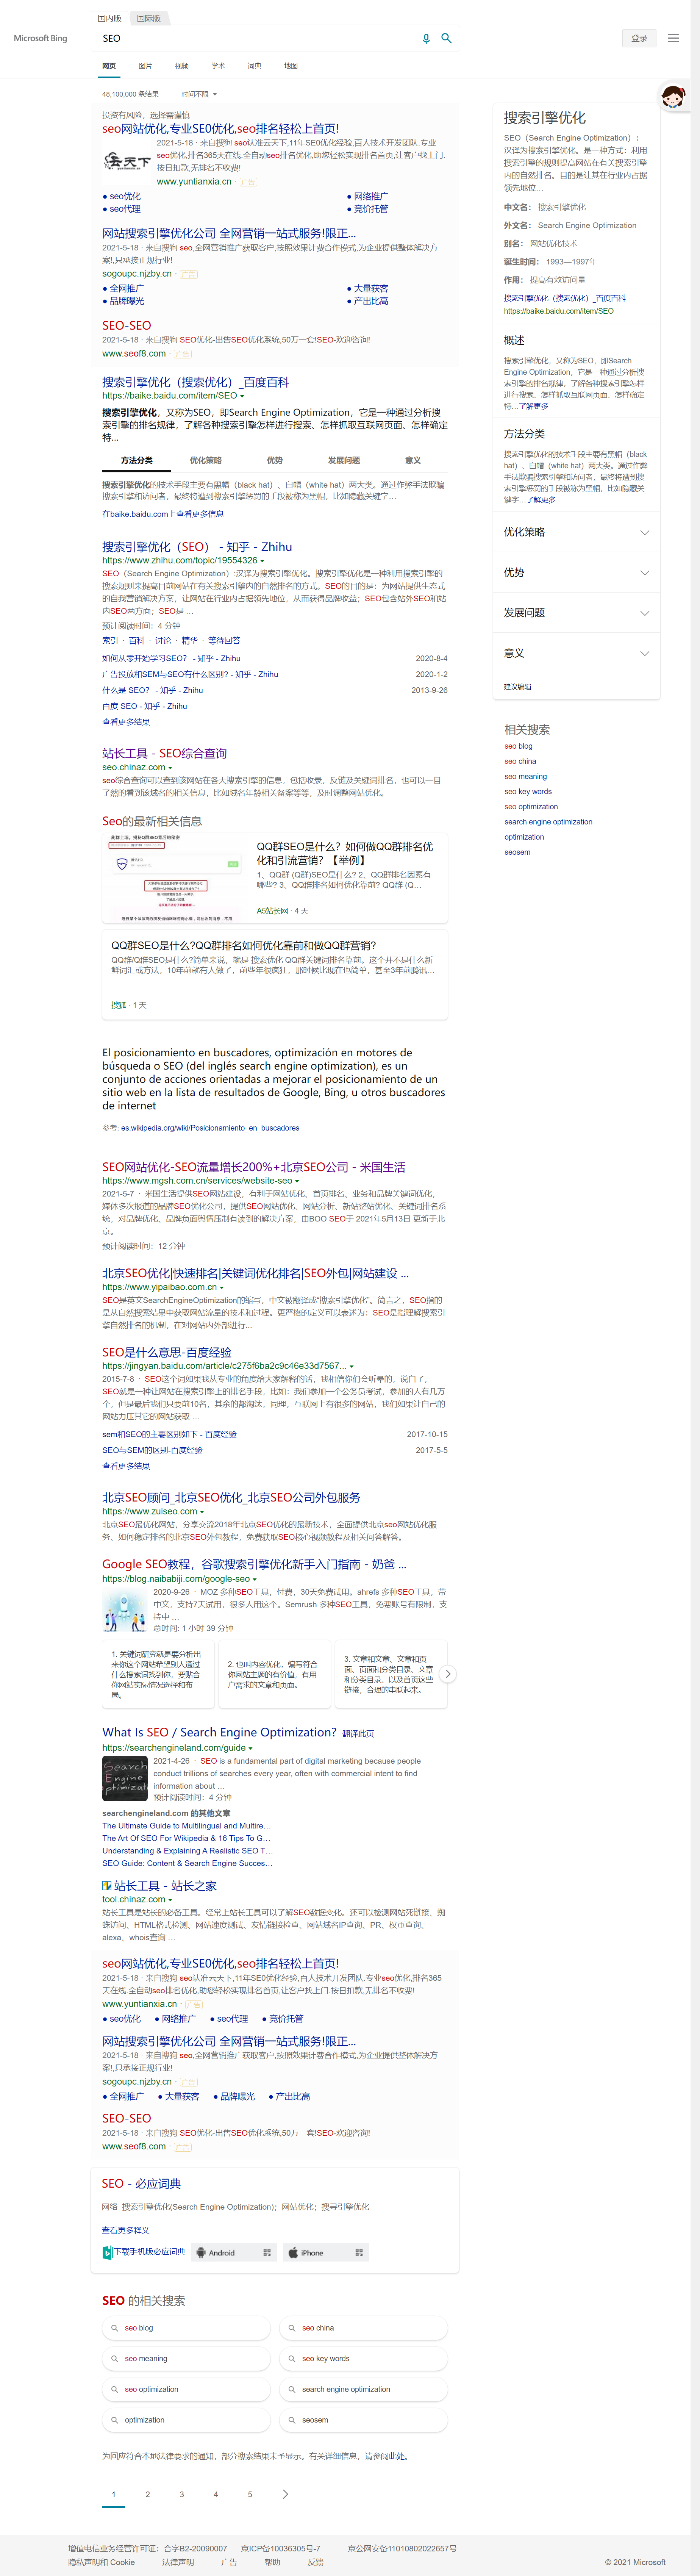 SEO - 国内版 Bing-SEO行业-米国生活